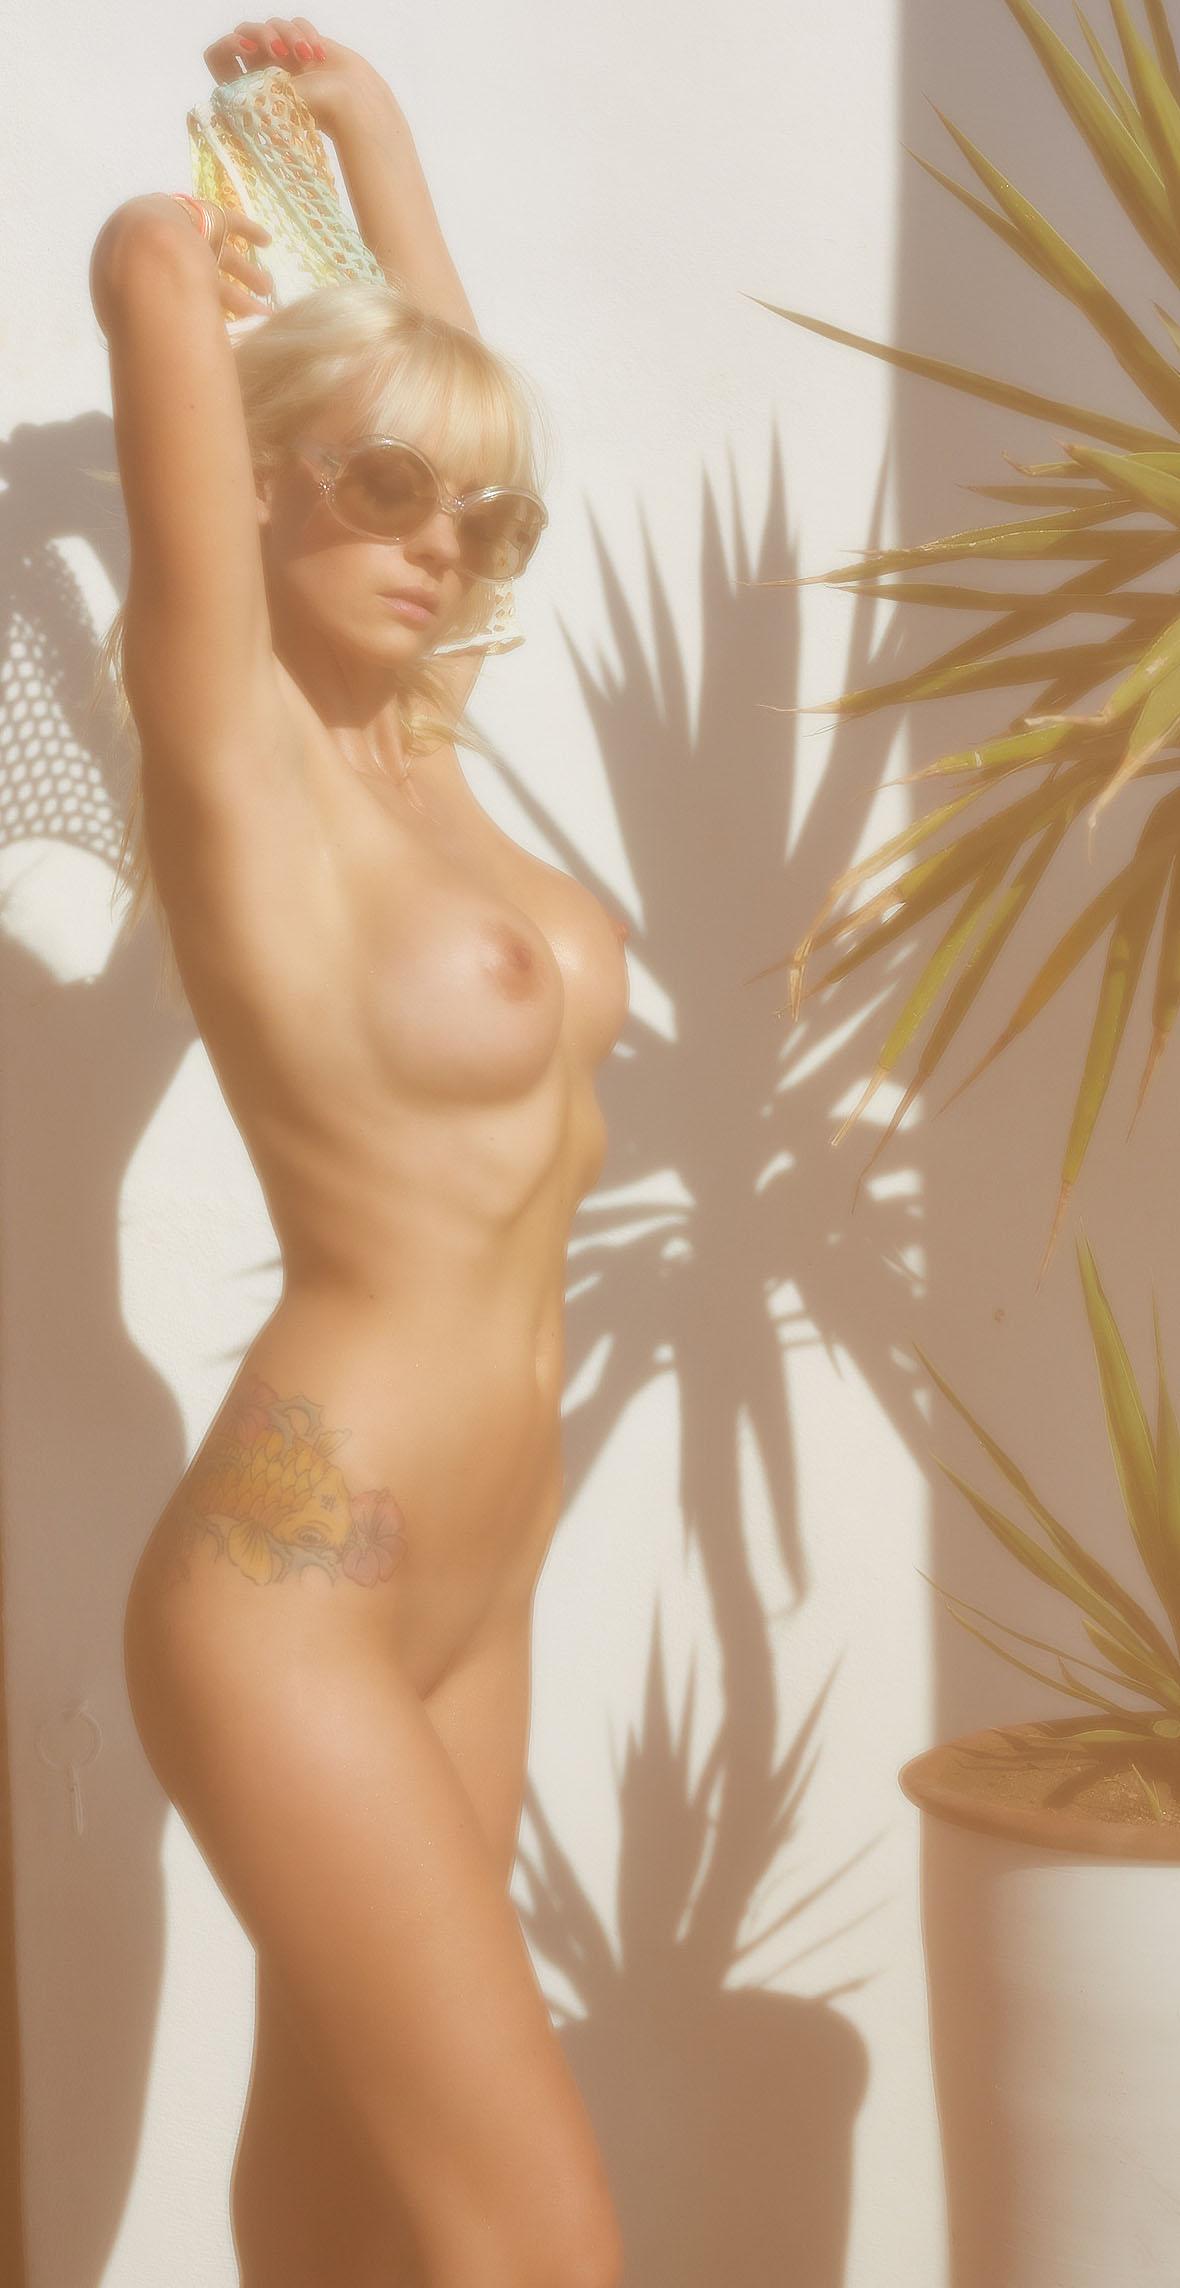 Sarah Domke Nackt. Foto - 42